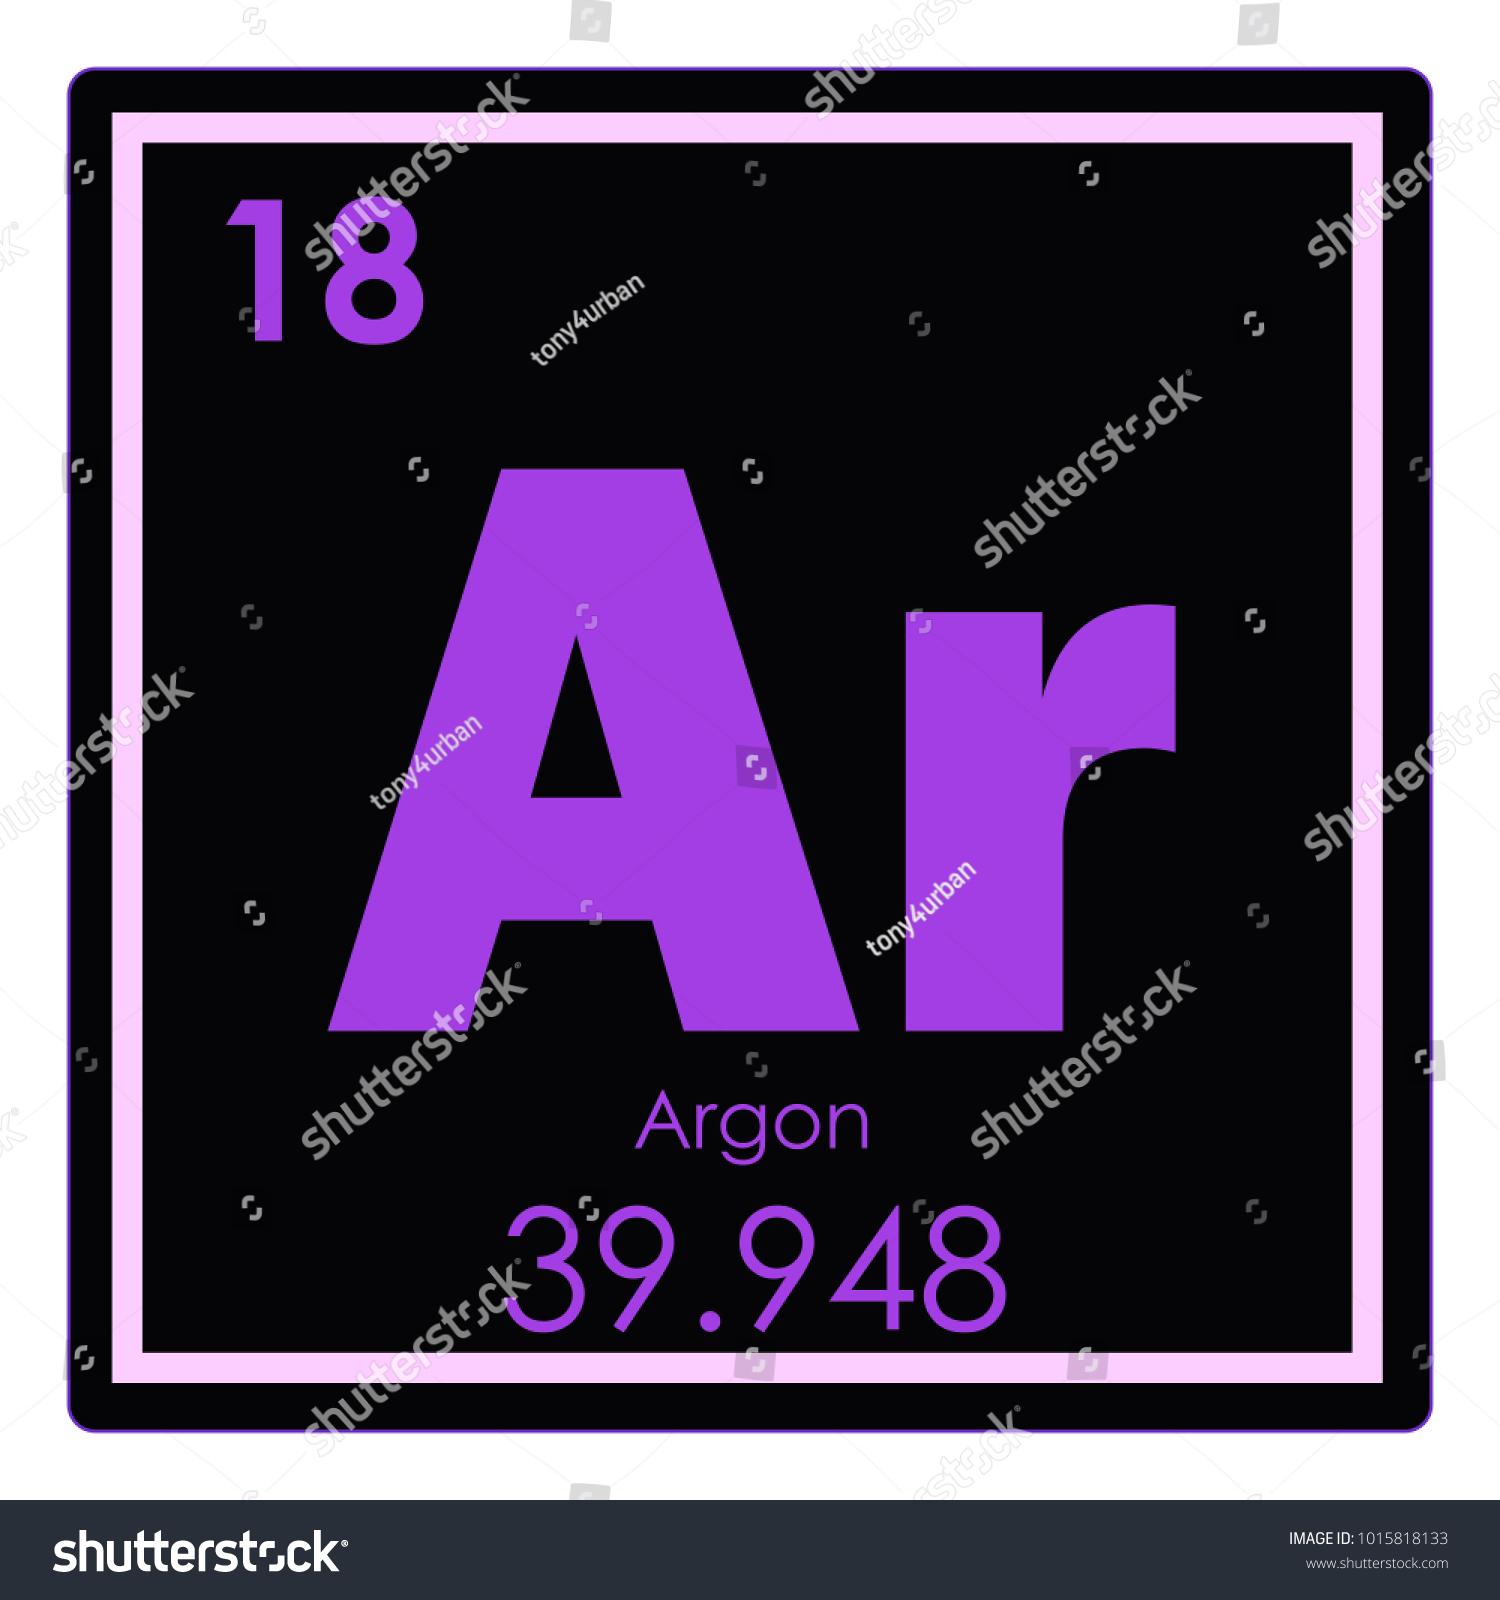 Periodic table symbol sb choice image periodic table and sample periodic table symbol sb gallery periodic table and sample with argon chemical element periodic table science urtaz Image collections